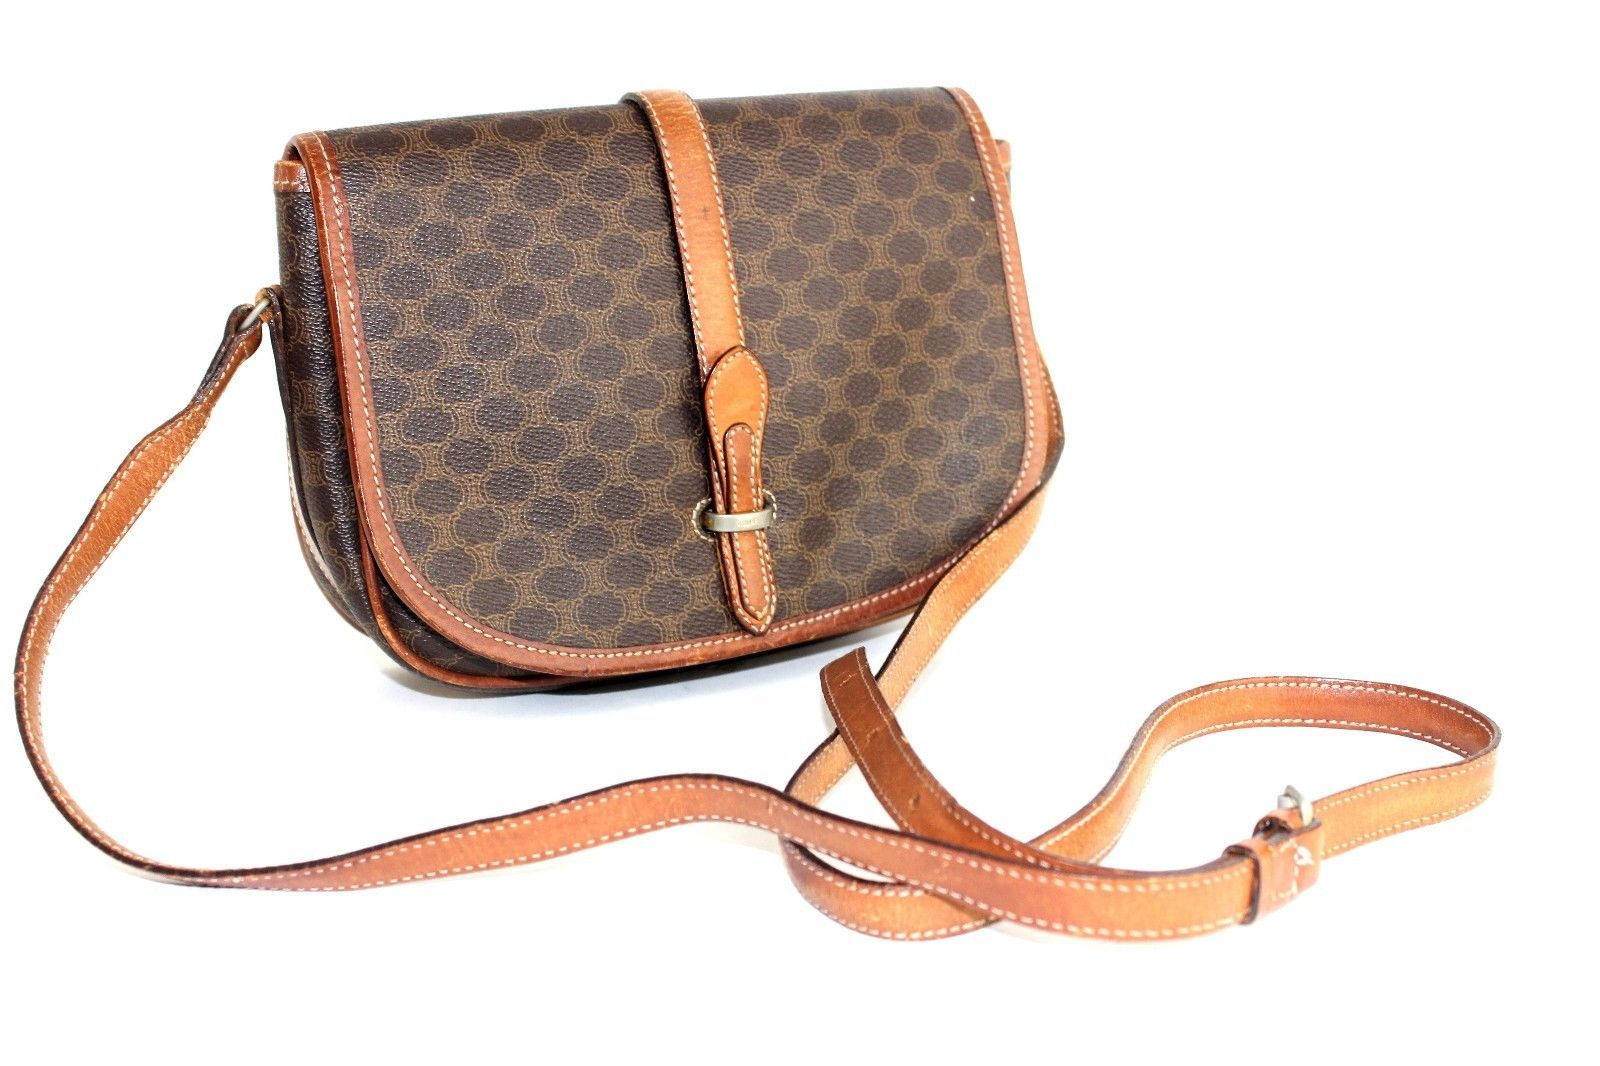 S l1600. S l1600. Previous. Authentic CELINE Macadam Canvas Leather PVC  Brown Crossbody Shoulder Bag Purse 659fa45bf302e